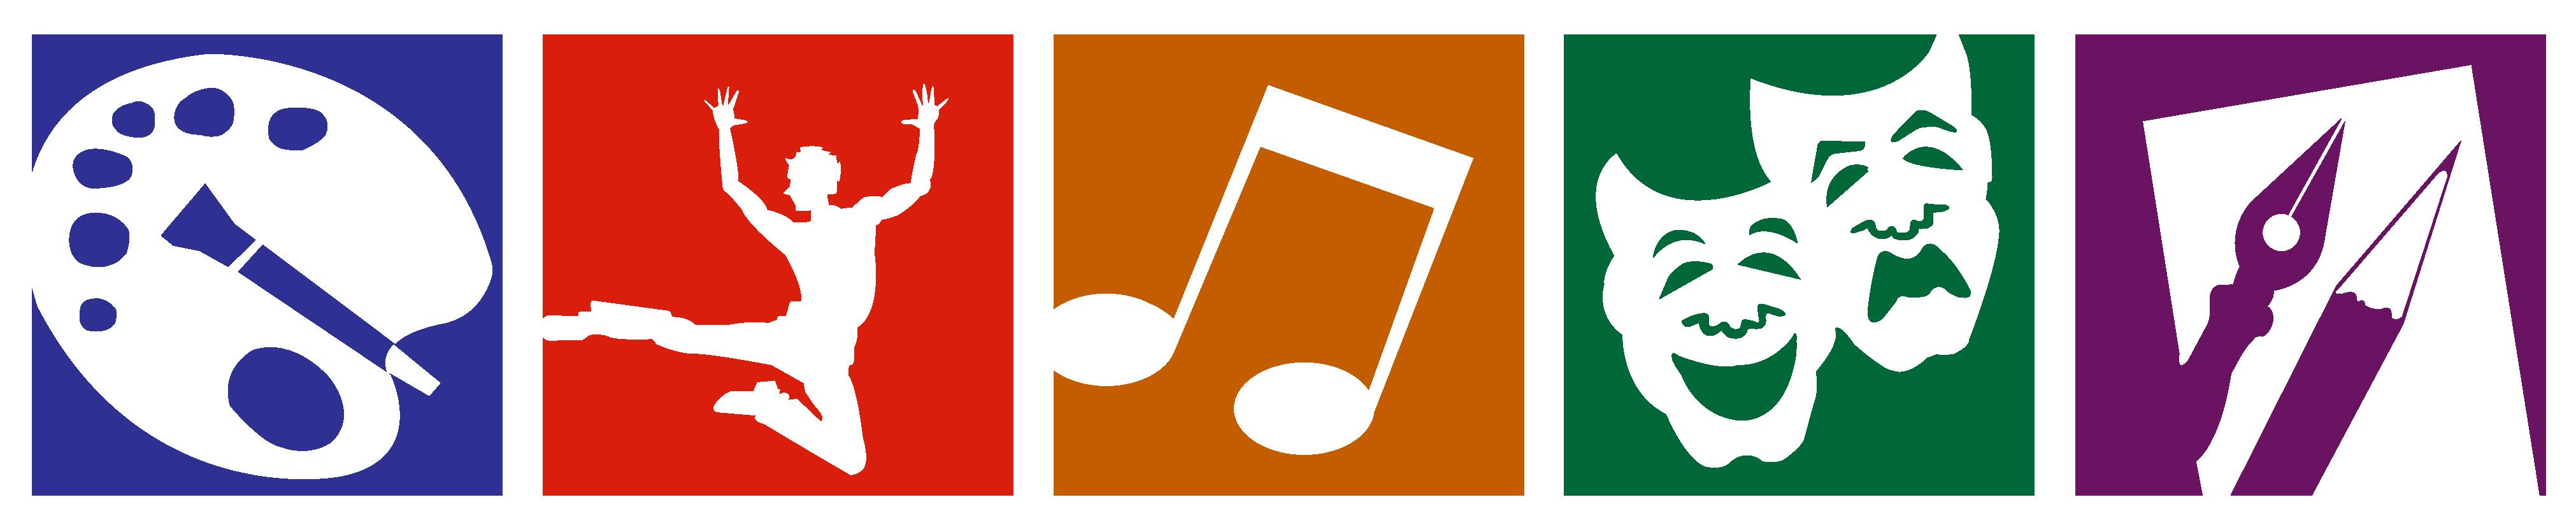 Logo Final SBVCA Icons-02